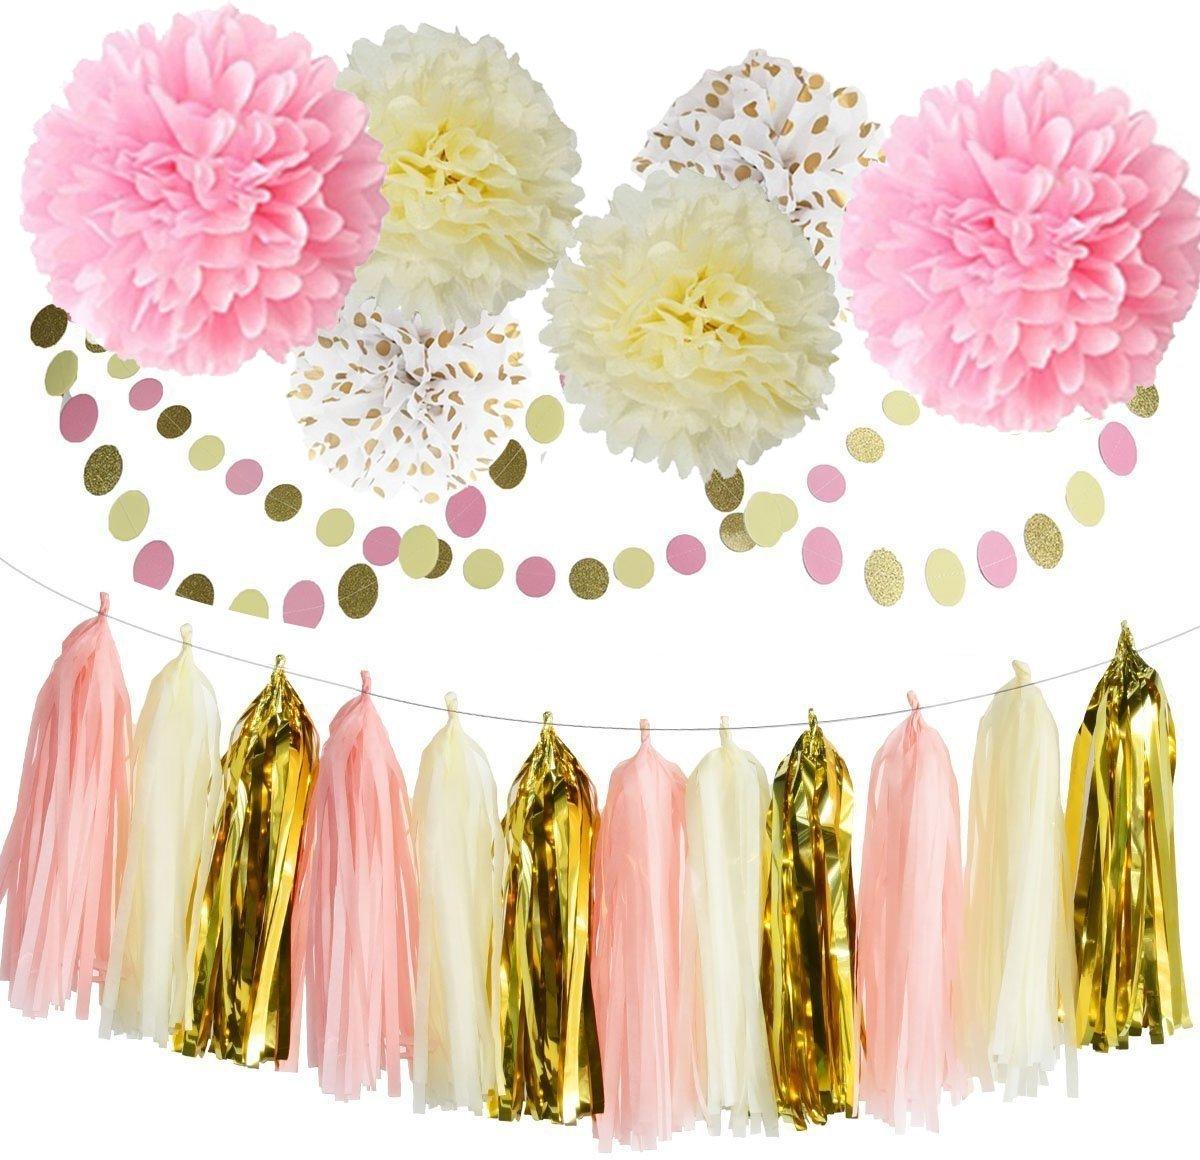 Amazon.com: Pom Poms Decoration 20PC Kit Party Tissue Paper Craft ...